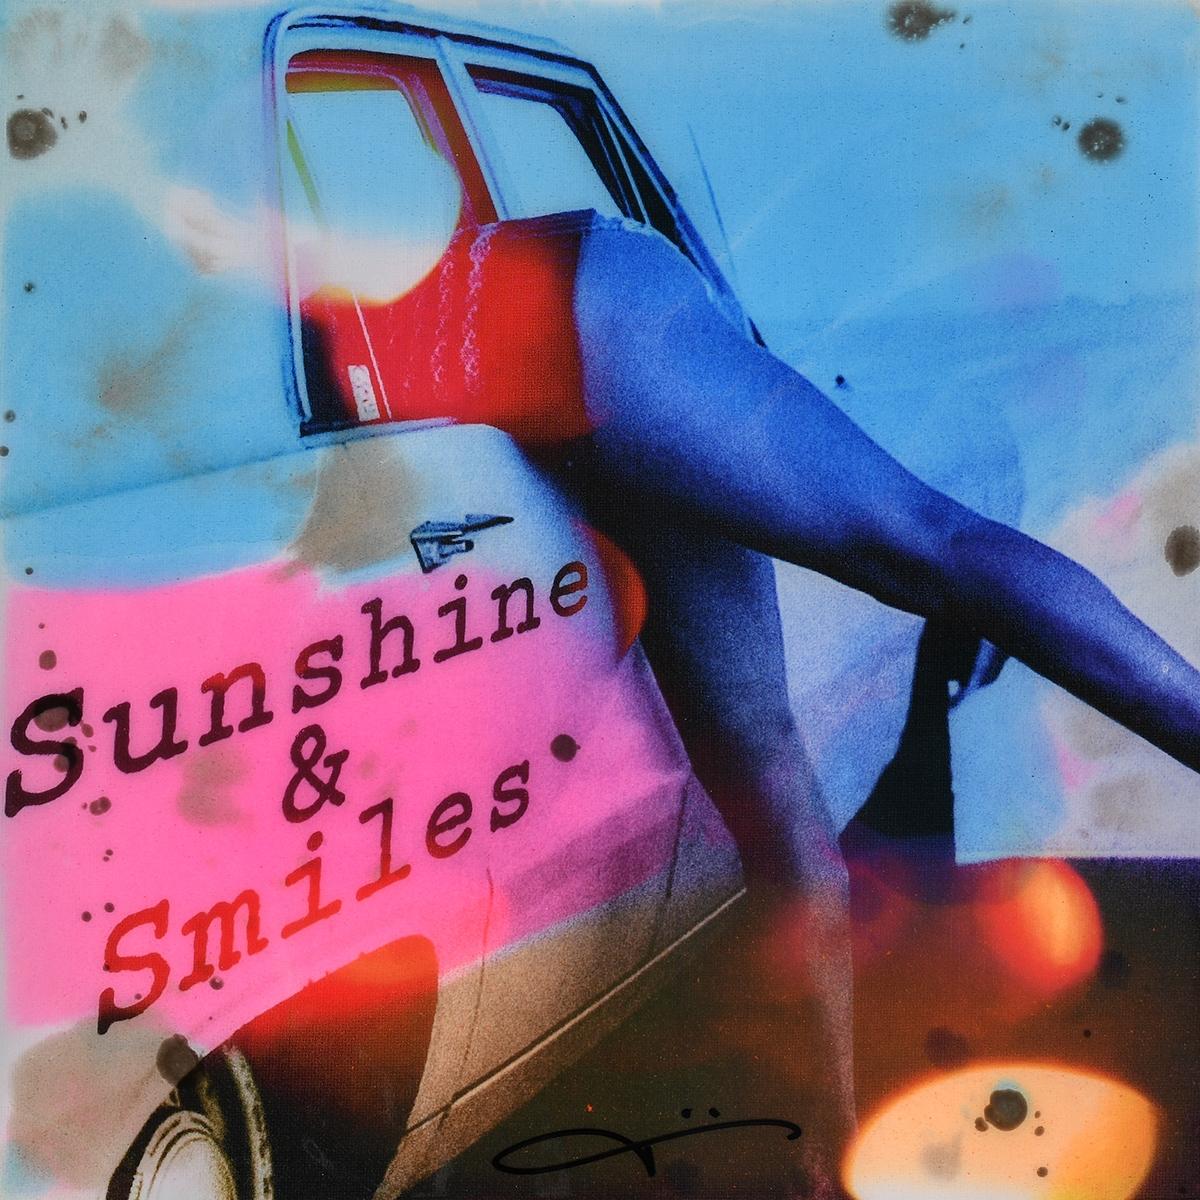 Sunshine & Smiles - Epoxy - 2019